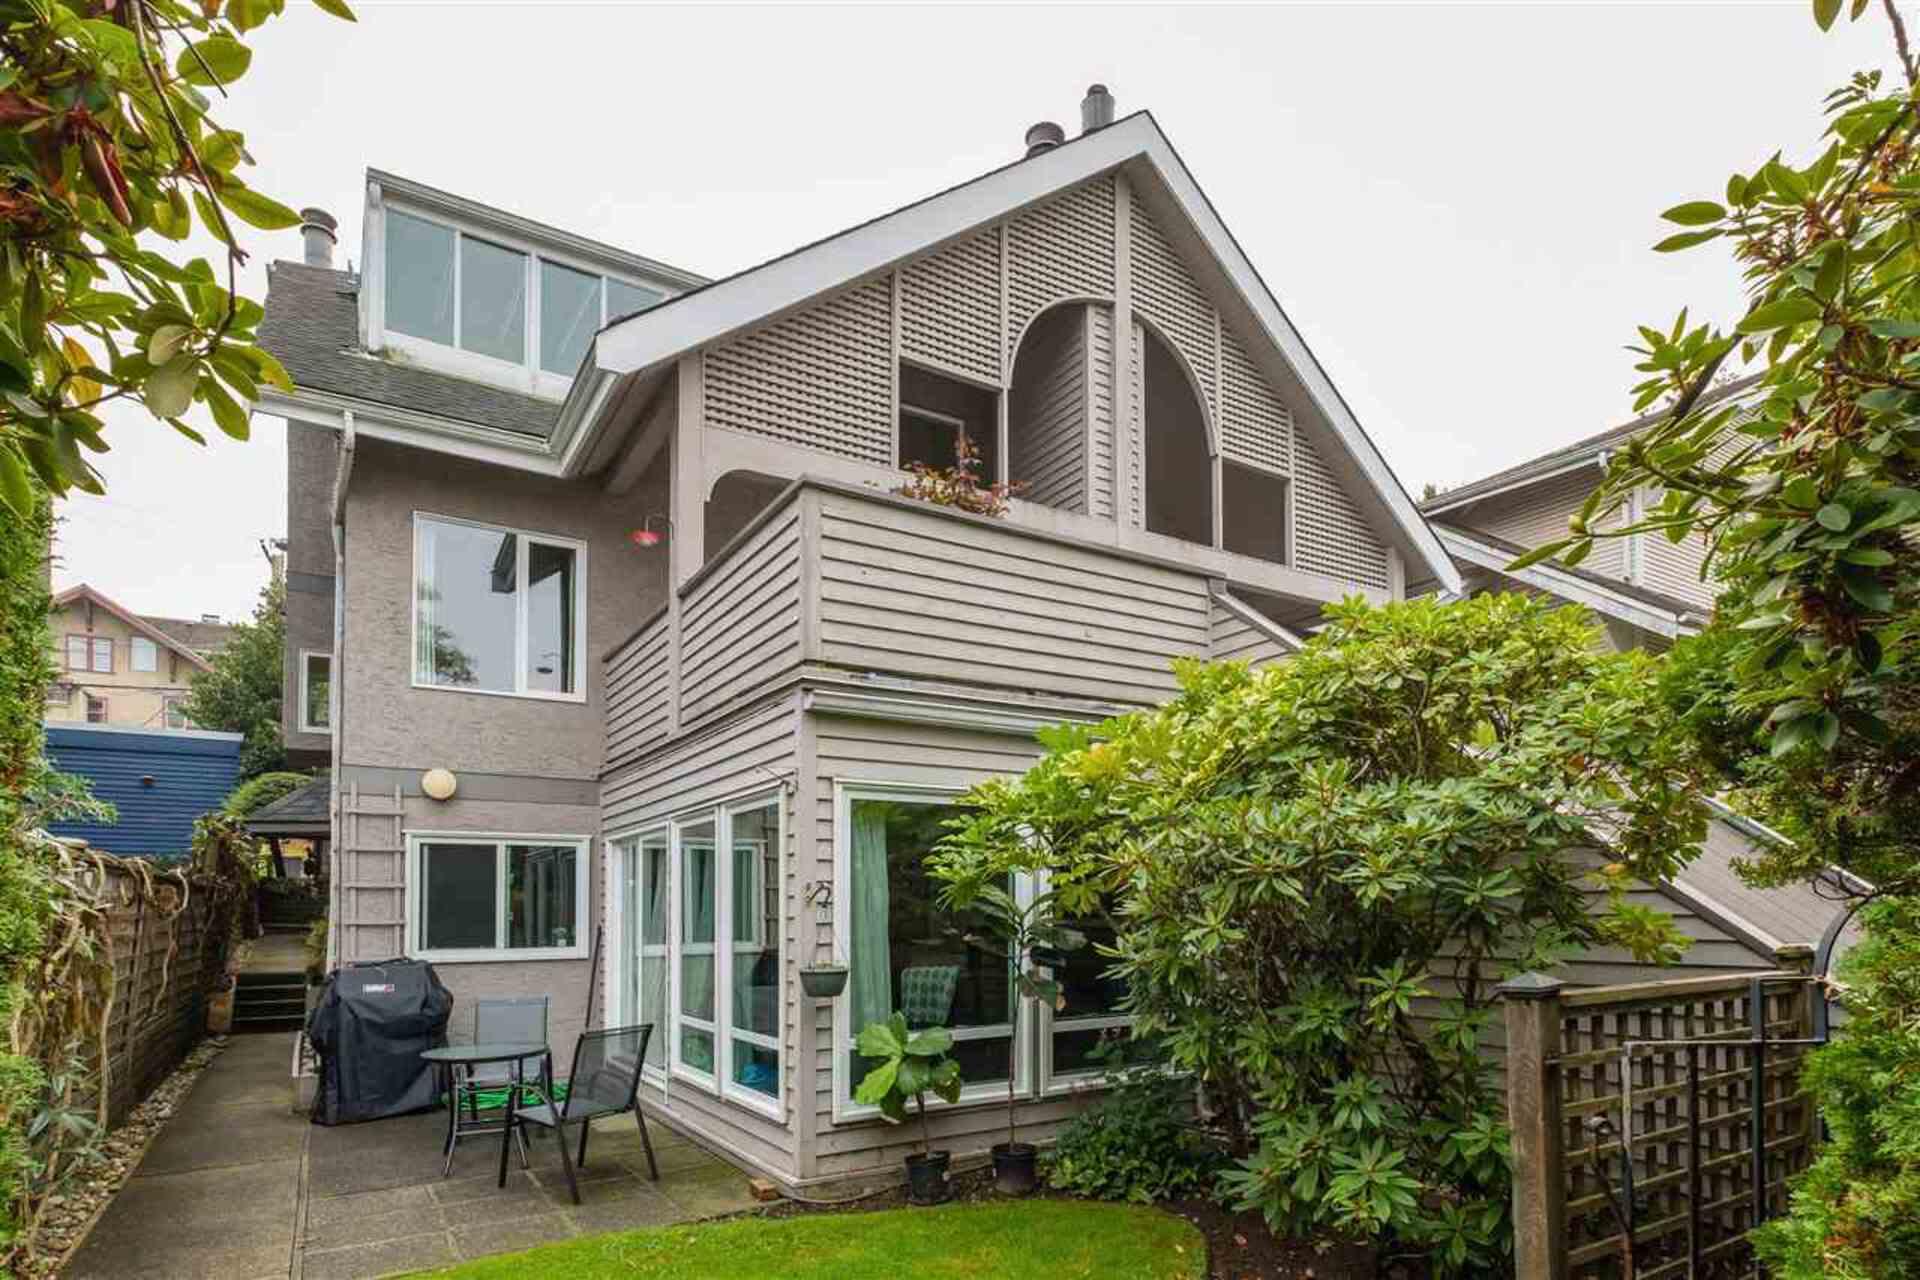 2536-cornwall-avenue-kitsilano-vancouver-west-01 at 2536 Cornwall Avenue, Kitsilano, Vancouver West